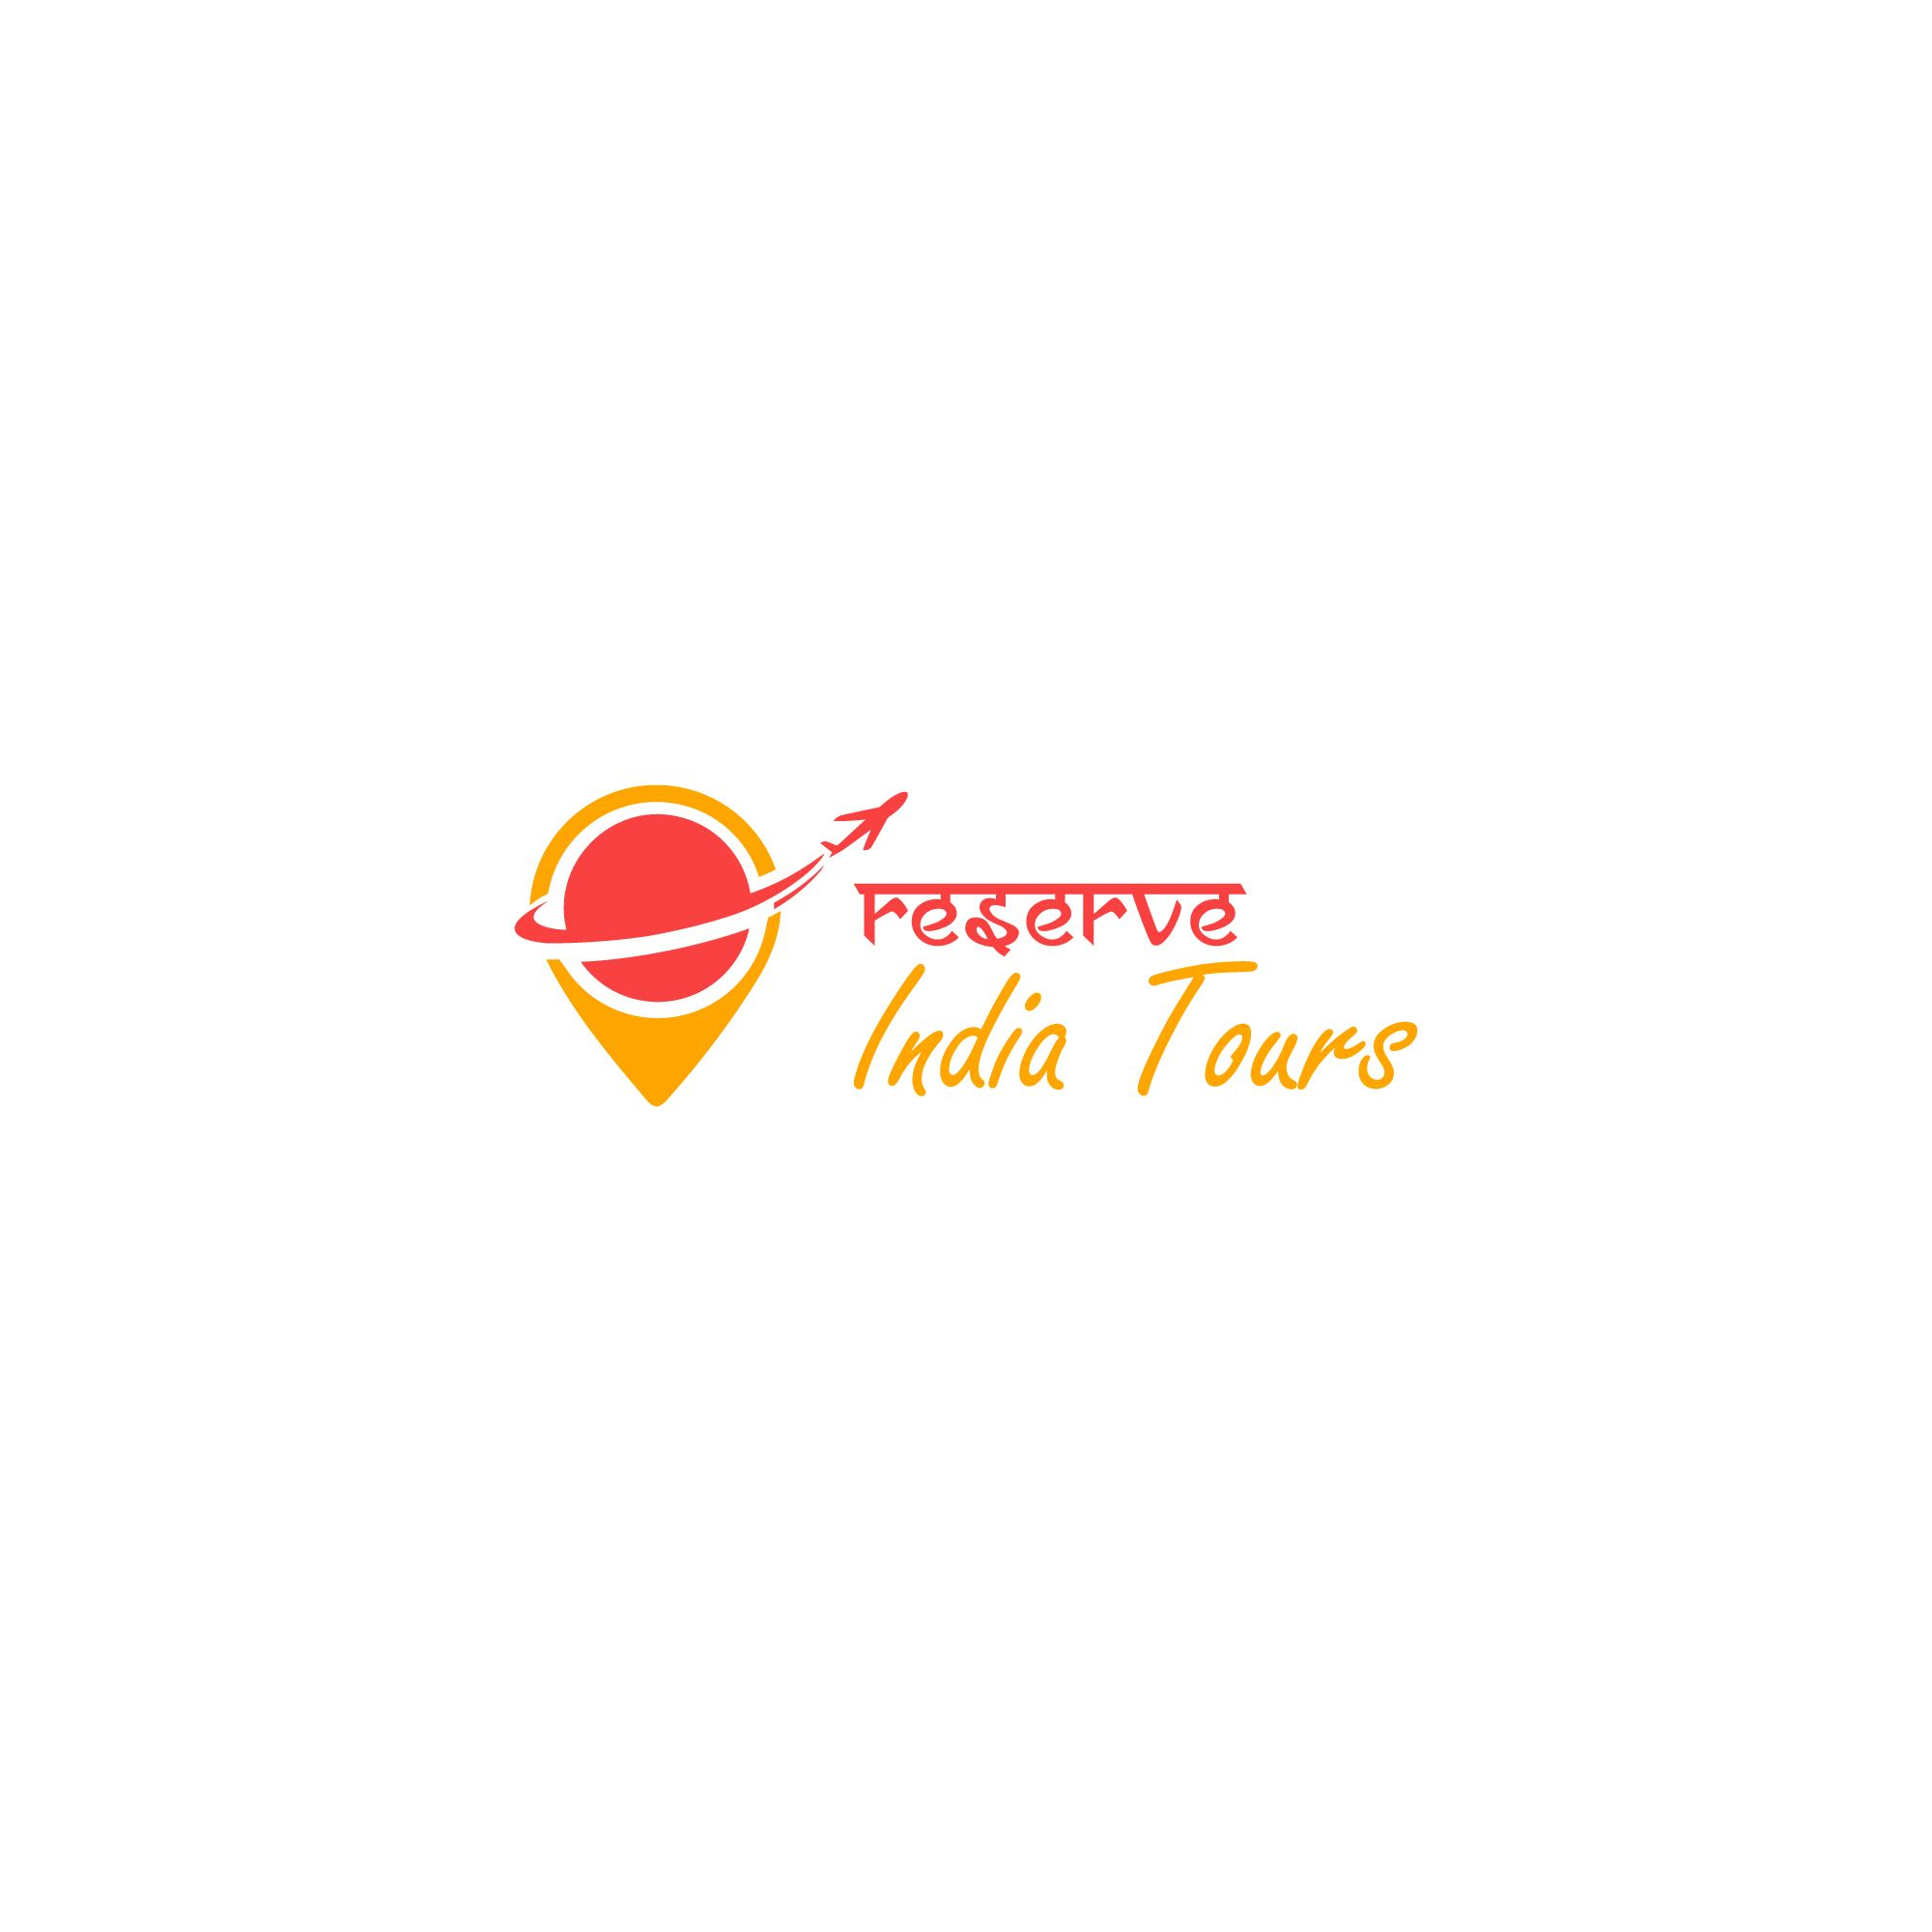 Reserve India Tours Logo